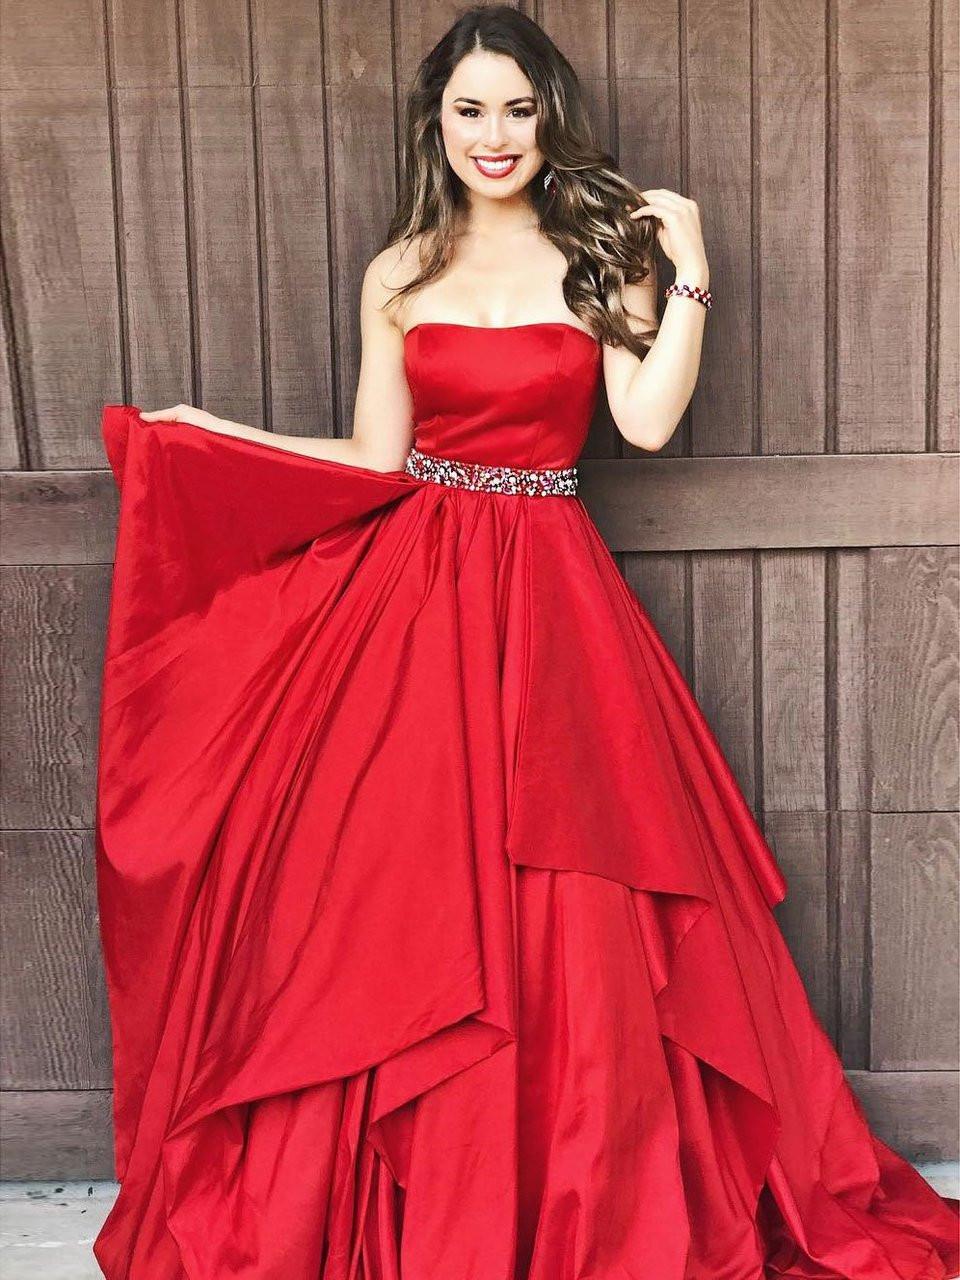 d8a6f84c77bd Red Prom Dresses,Strapless Prom Dresses,Ruffles Prom Dress,11217 -  Landress.co.uk